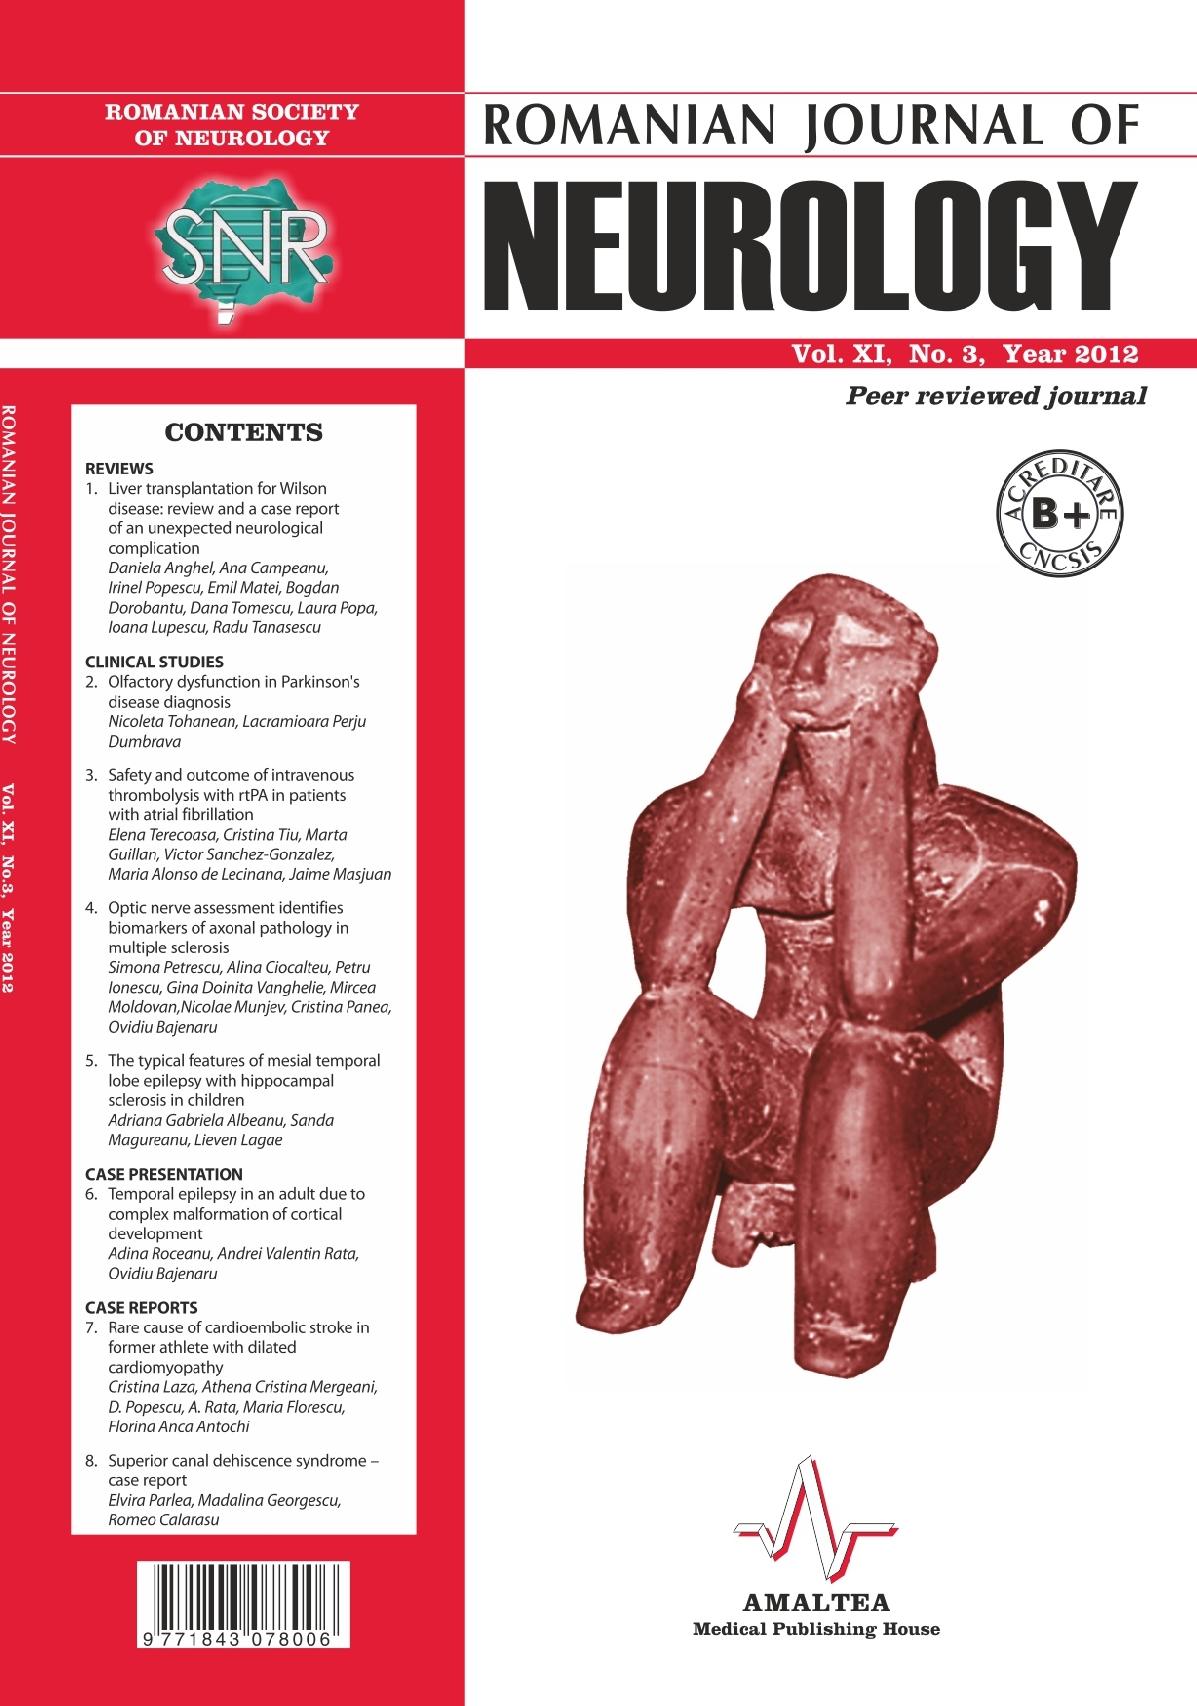 Romanian Journal of Neurology, Volume XI, No. 3, 2012